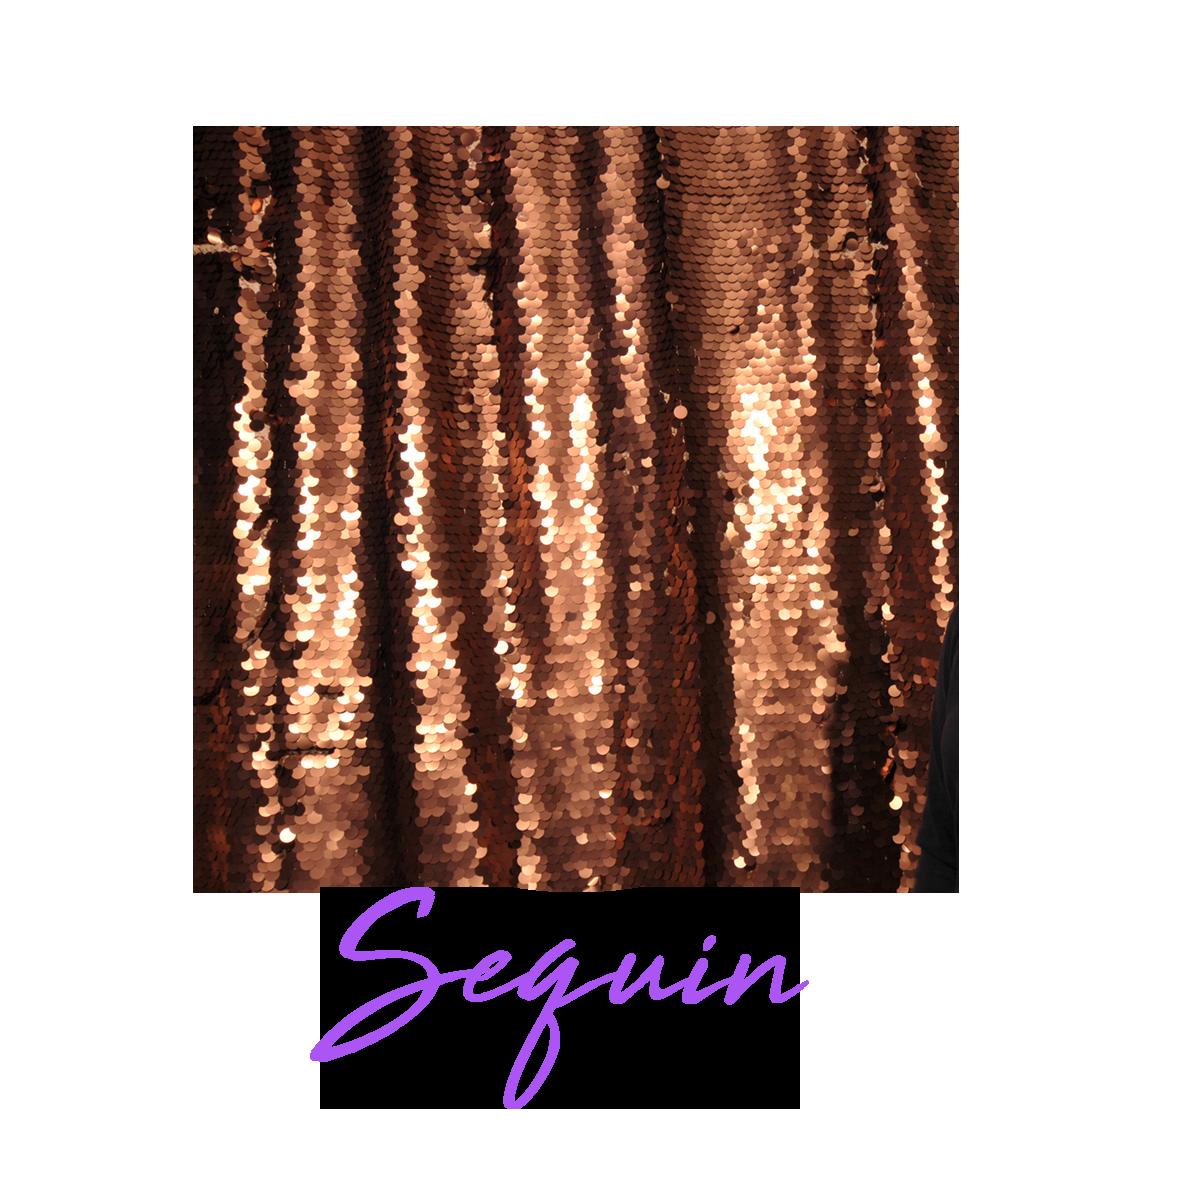 Sequin.png